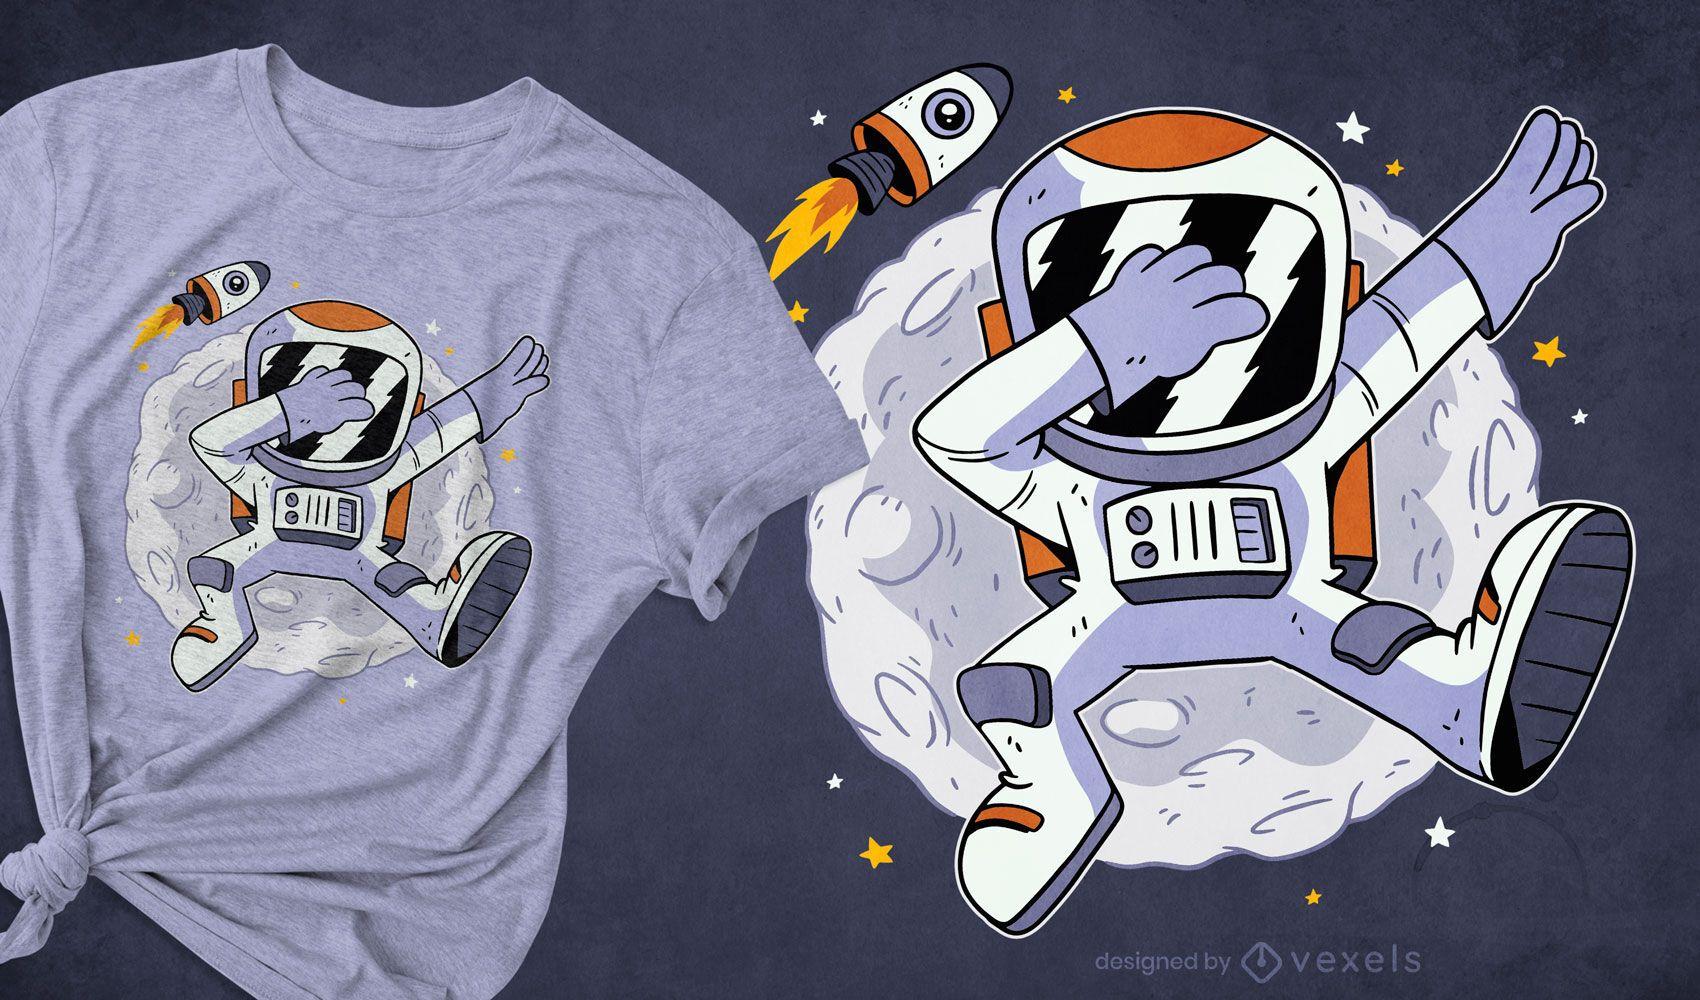 Astronaut dabbing in space t-shirt design